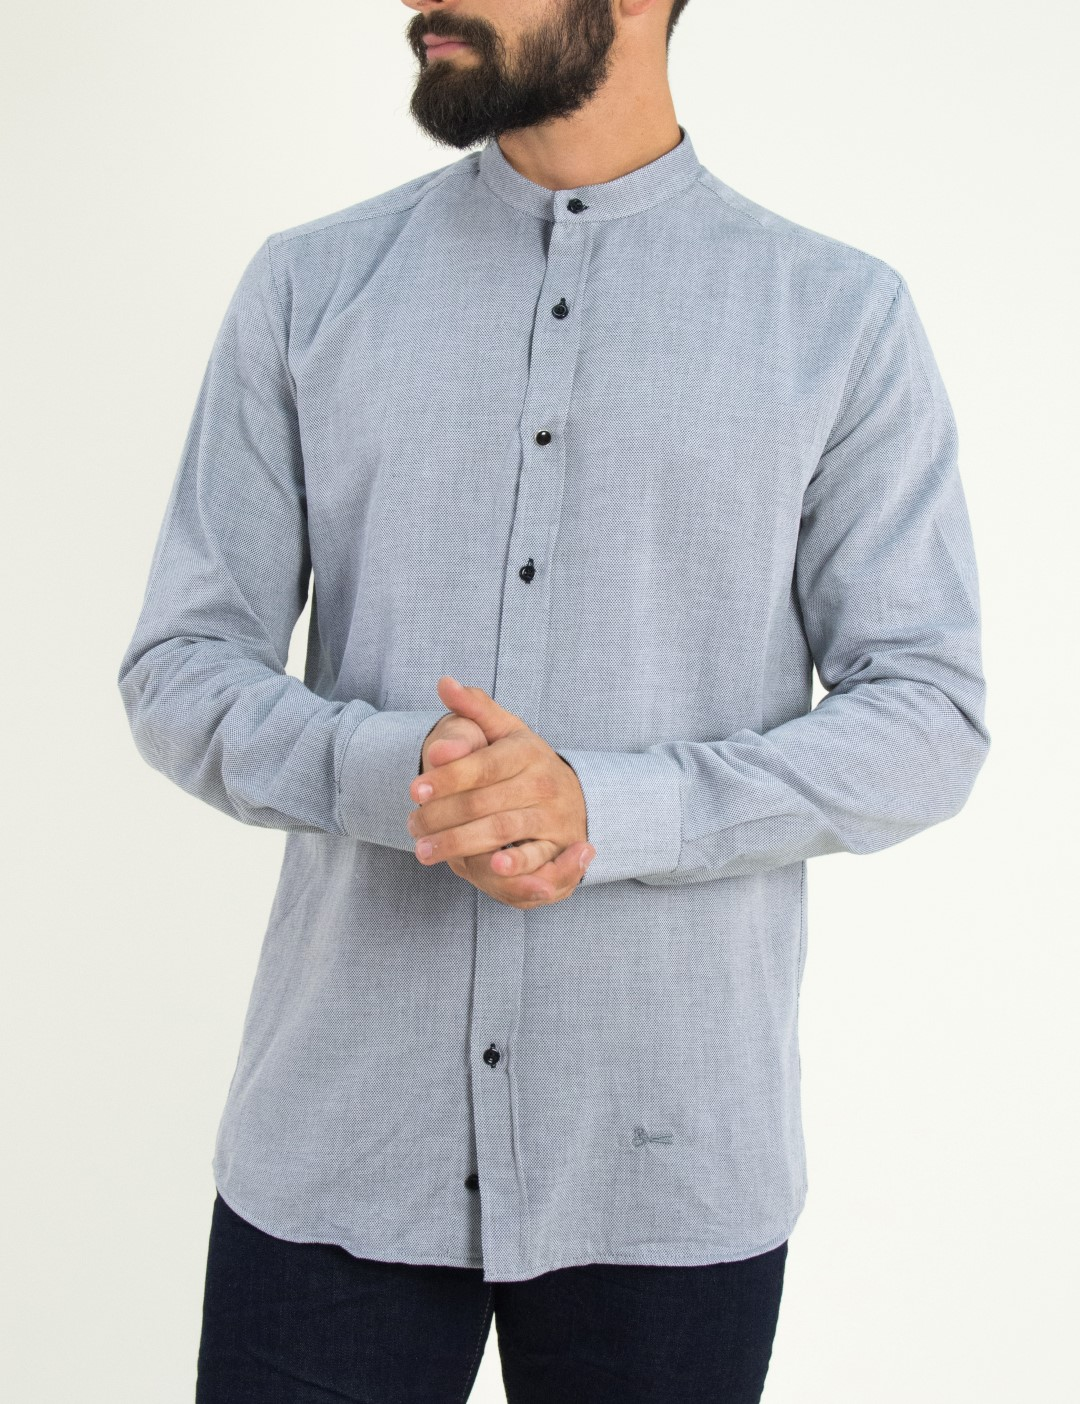 3e98ae86b713 Ανδρικό γκρι πουκάμισο με μάο γιακά Ben Tailor 0089